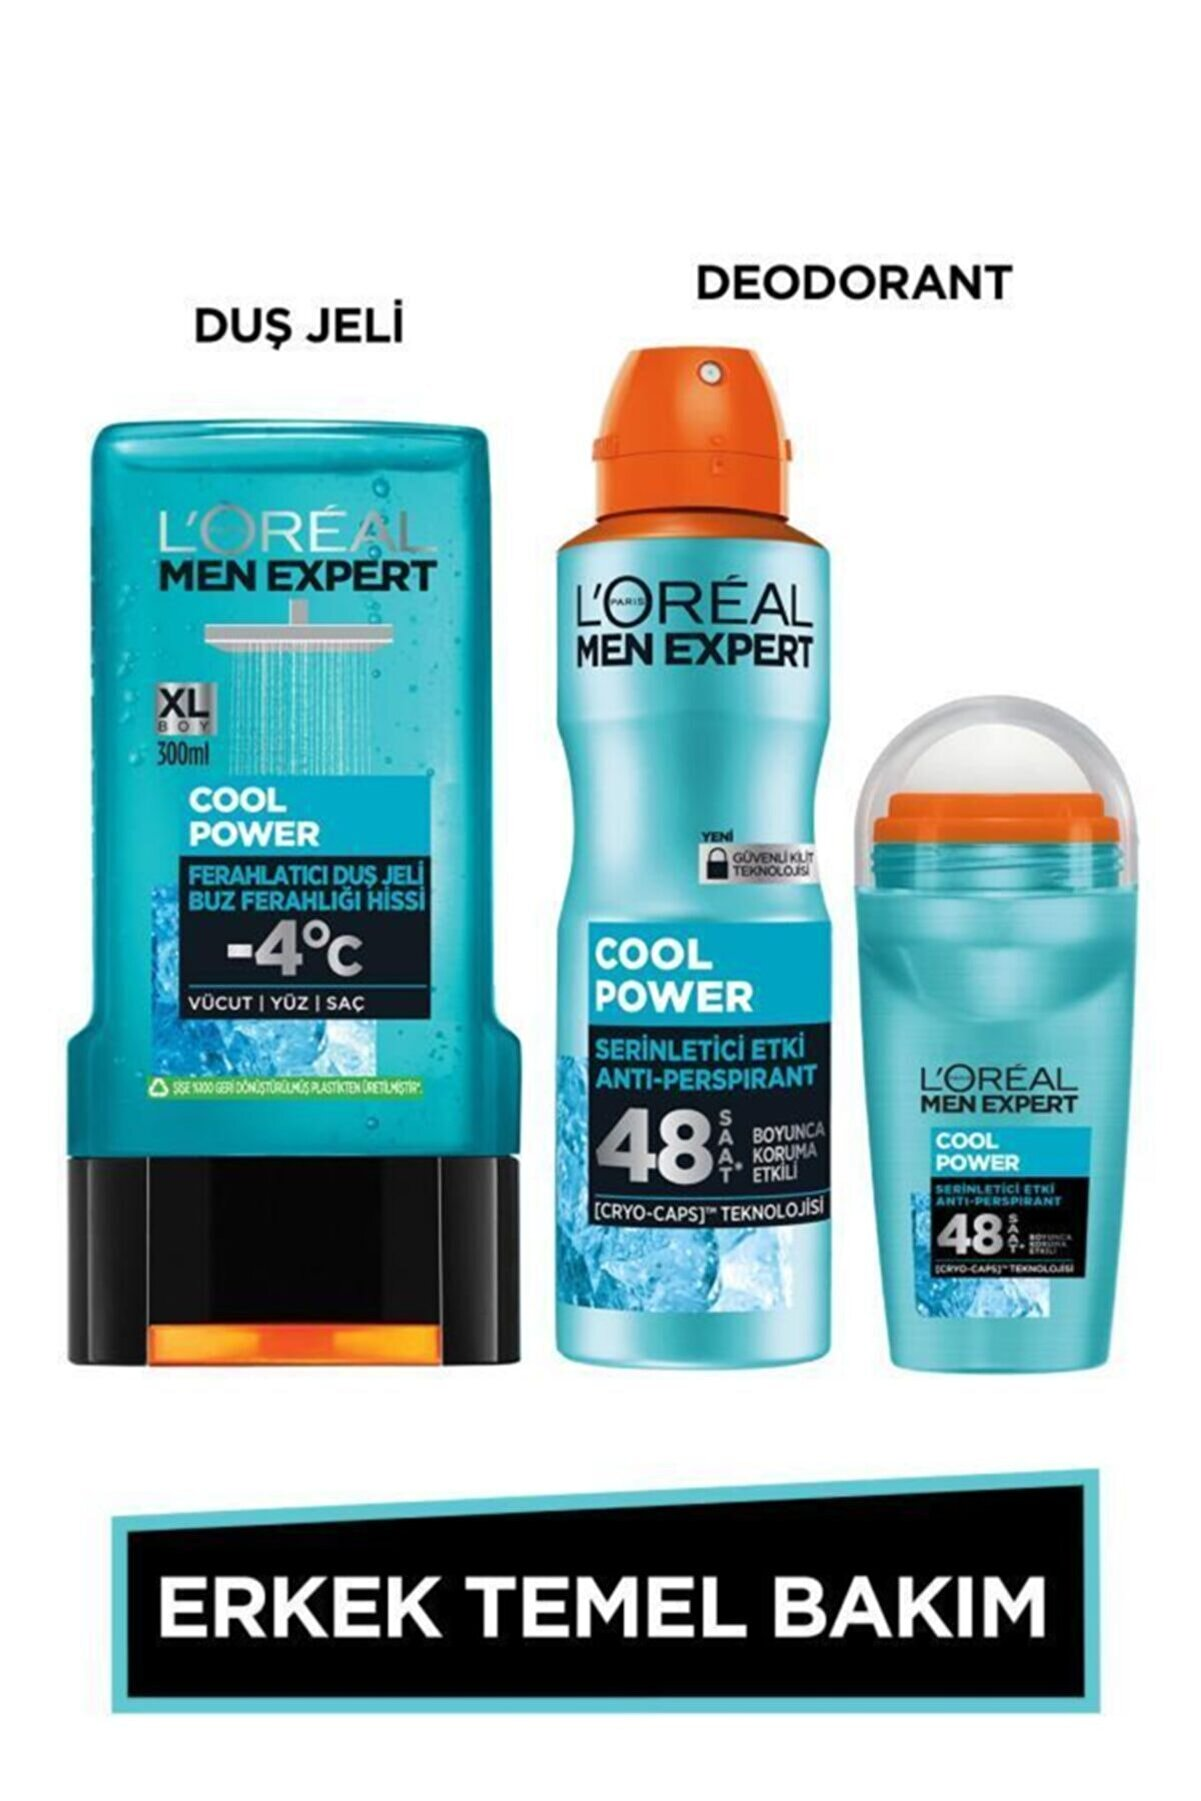 L'Oreal Paris Men Expert Erkek Temel Bakım Seti Cool Power Ferahlatıcı Duş Jeli 300ml + Cool Power Deodorant + Roll on